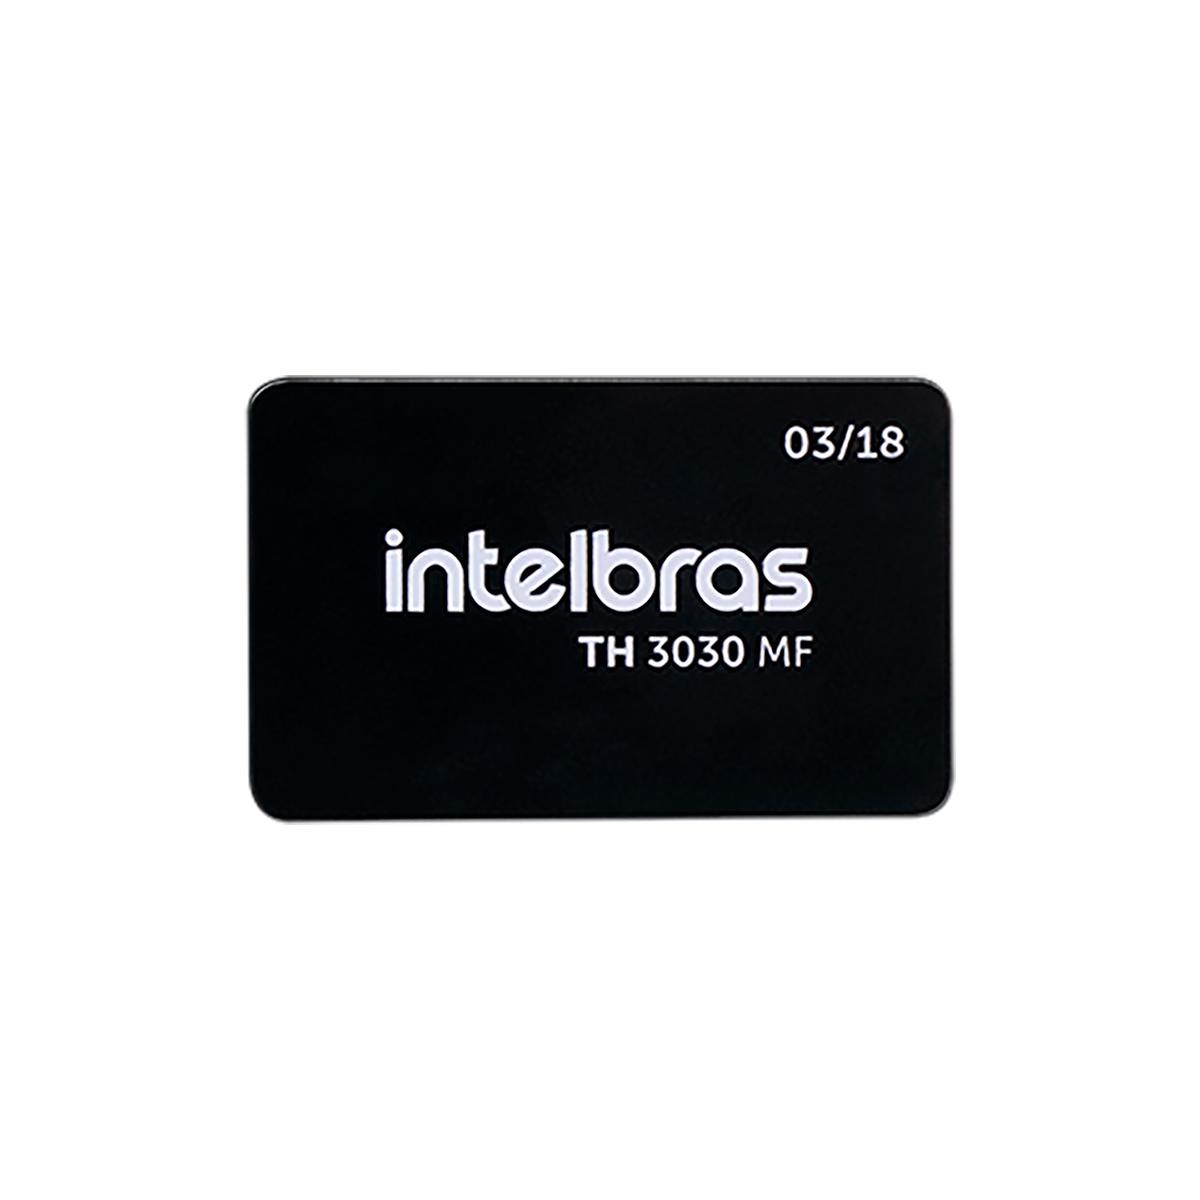 Tag de Acesso Intelbras TH 3030 MF Mifare Etiqueta Adesiva